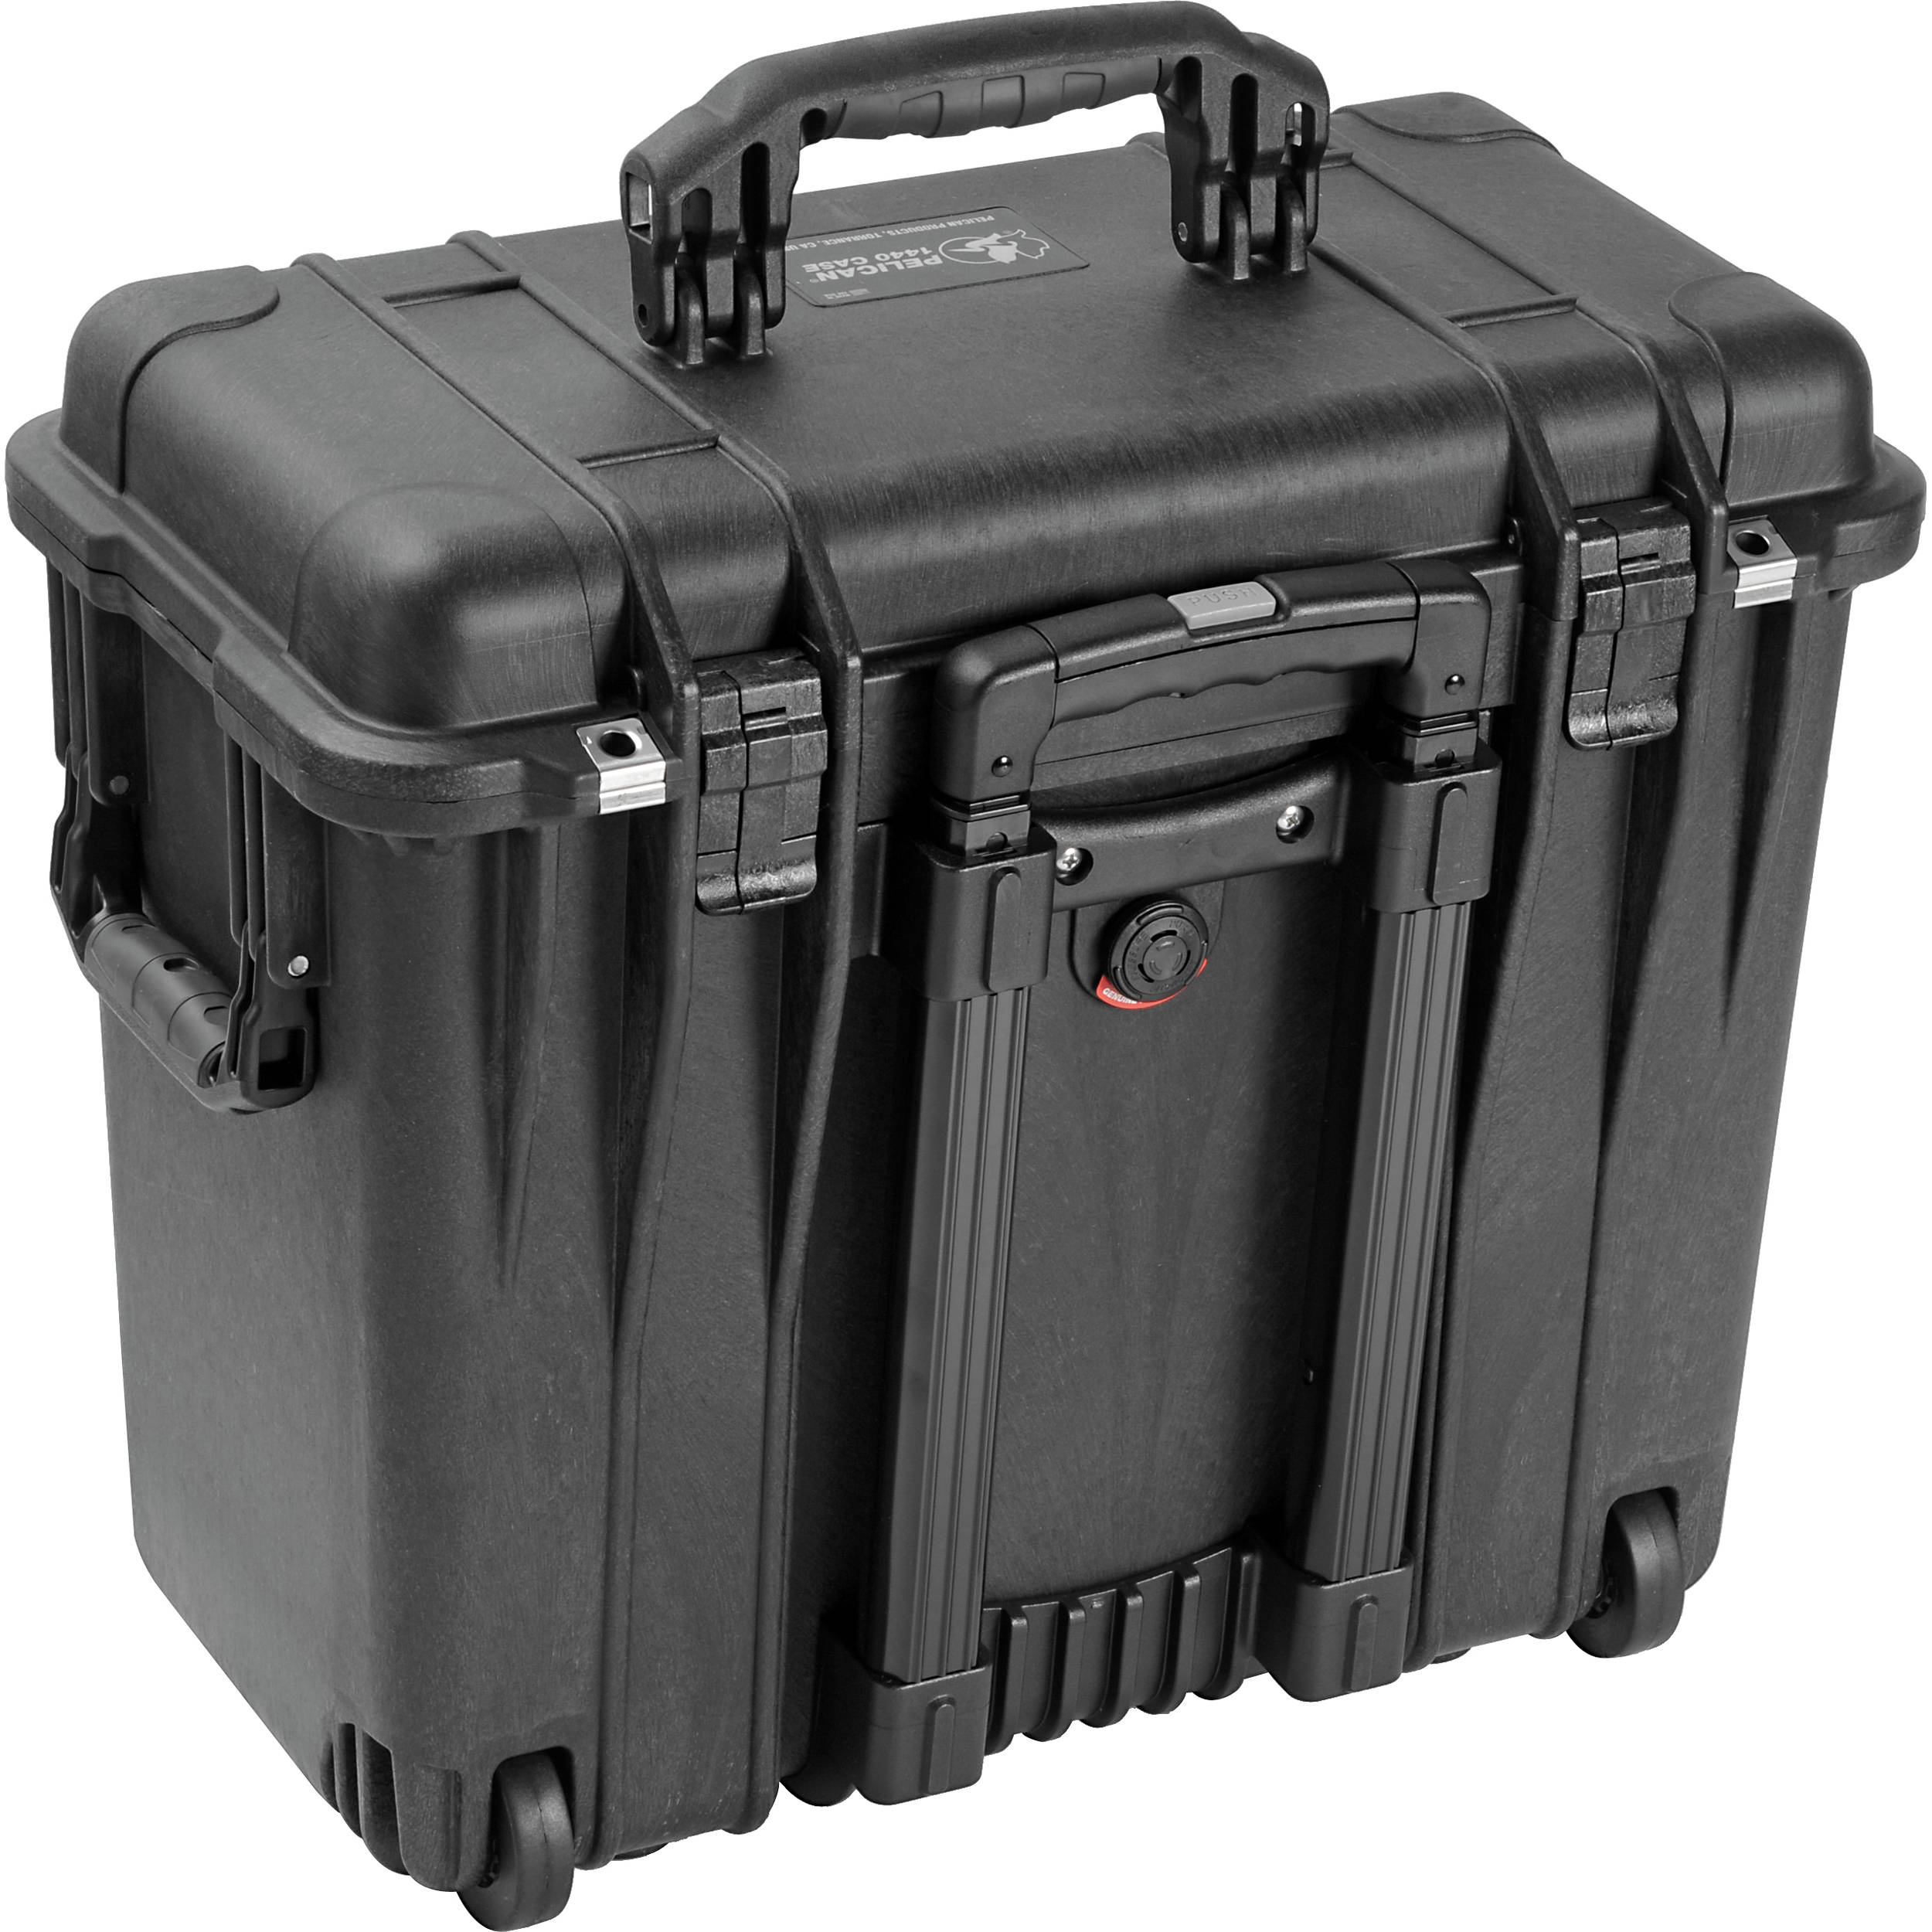 Pelican 1440 Top Loader Case without Foam (Black)